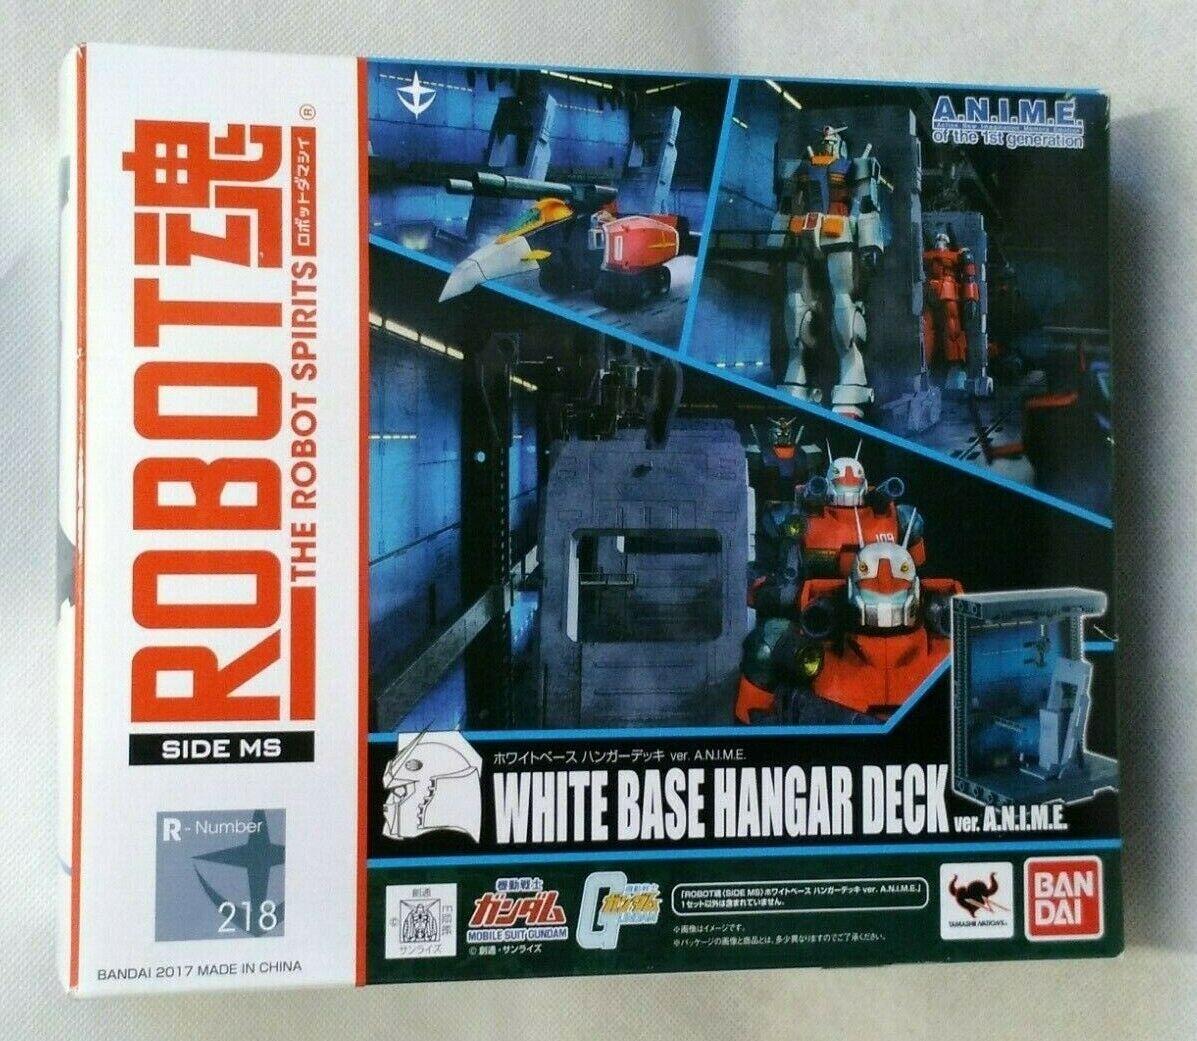 Robot Spirits Mobile Suit Gundam lado Miss blancoo Base Colgador Cubierta Ver. a.n.i.m.e.